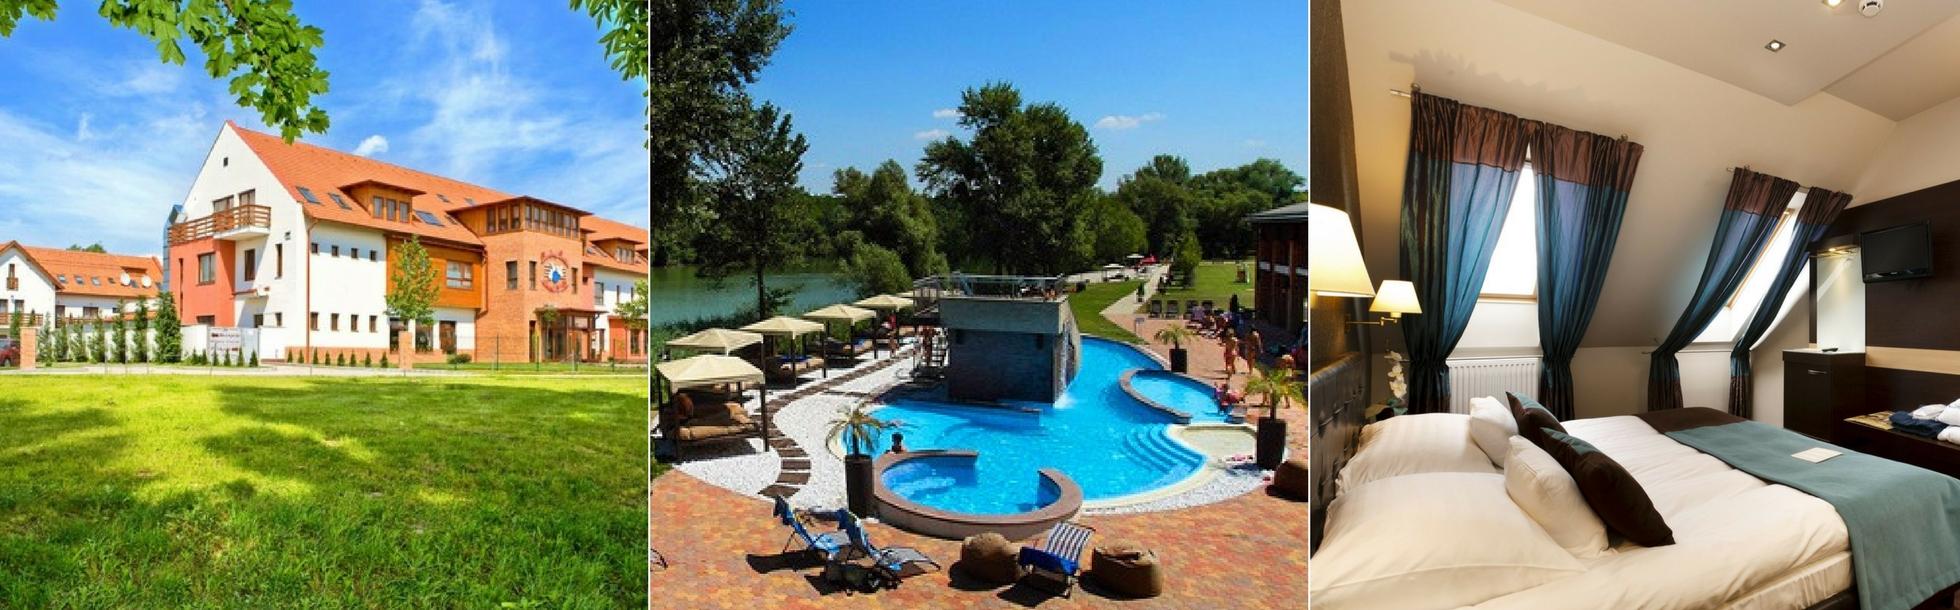 Diamant Hotel Spa & Family Resort ****superior Szigetköz - {ej} - {old_price} helyett {kedvezmeny} kedvezménnyel